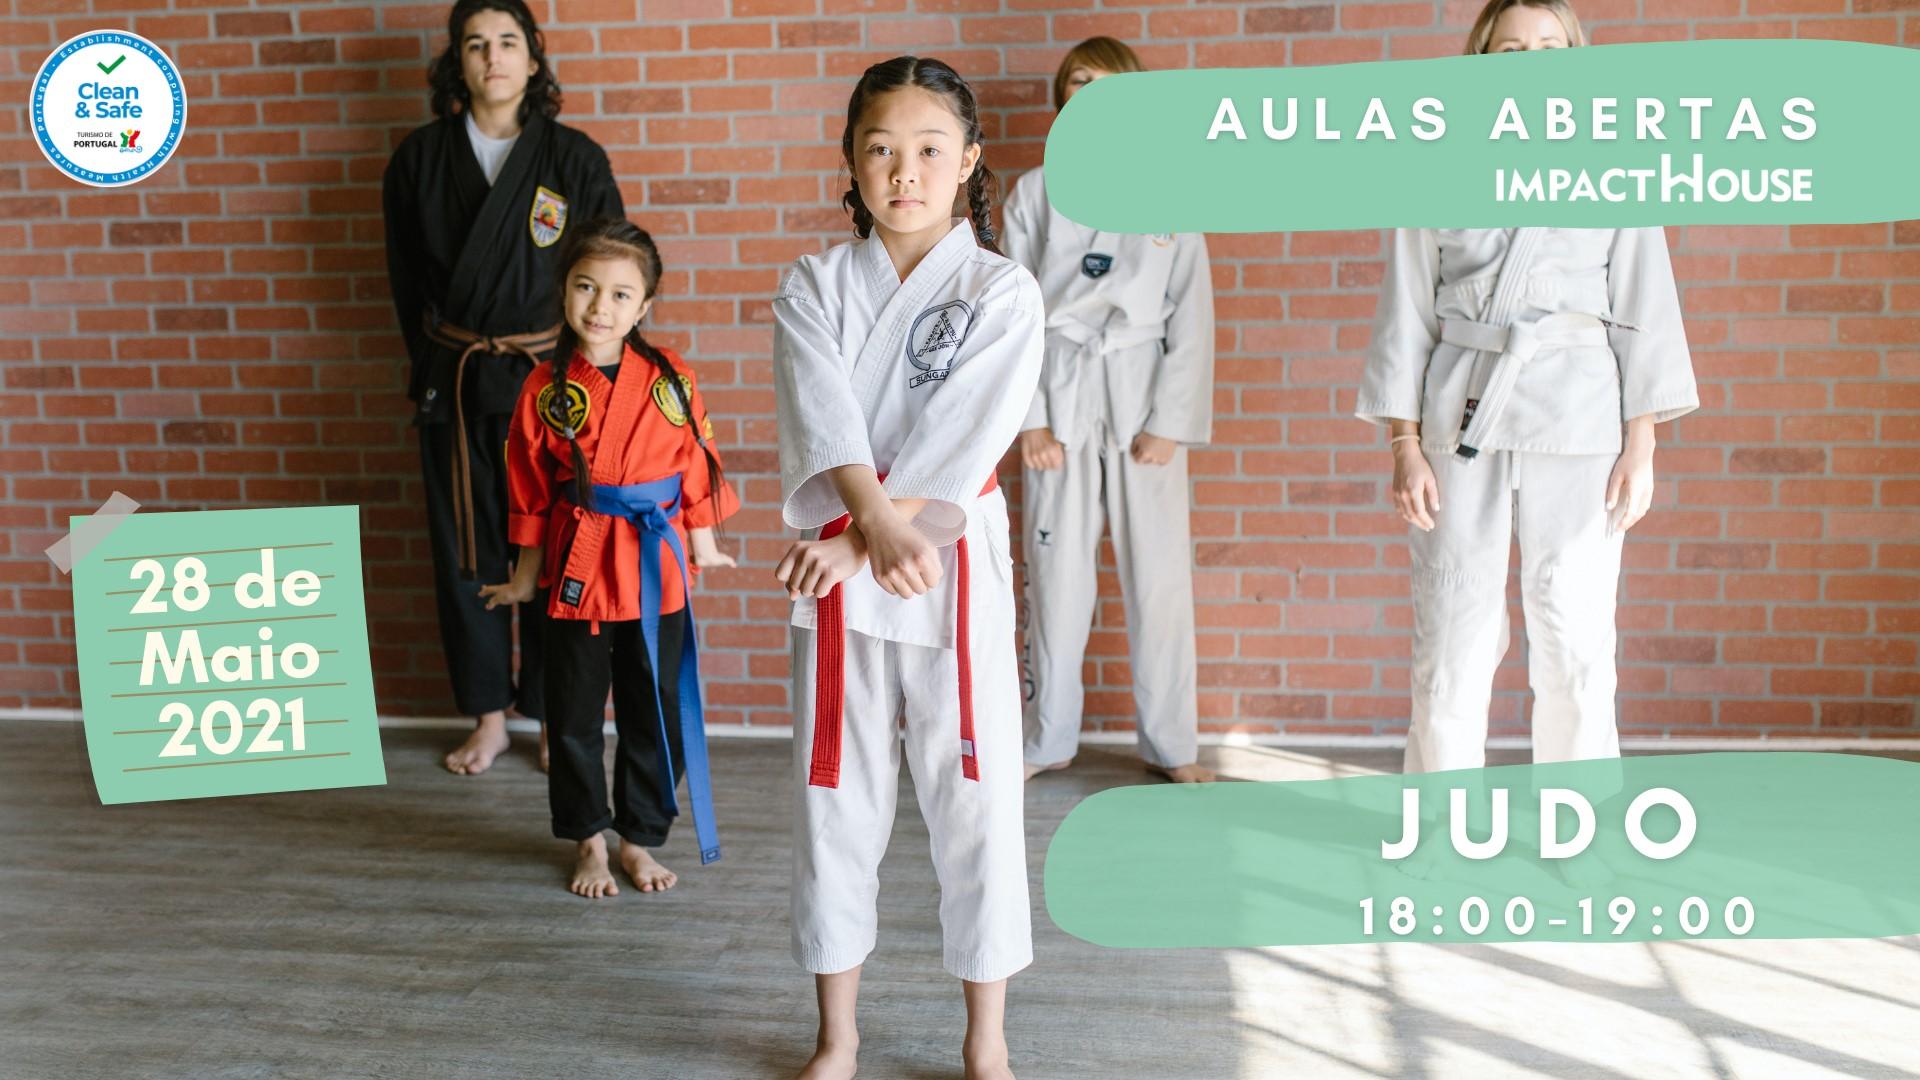 Aula Aberta - Judo para Famílias